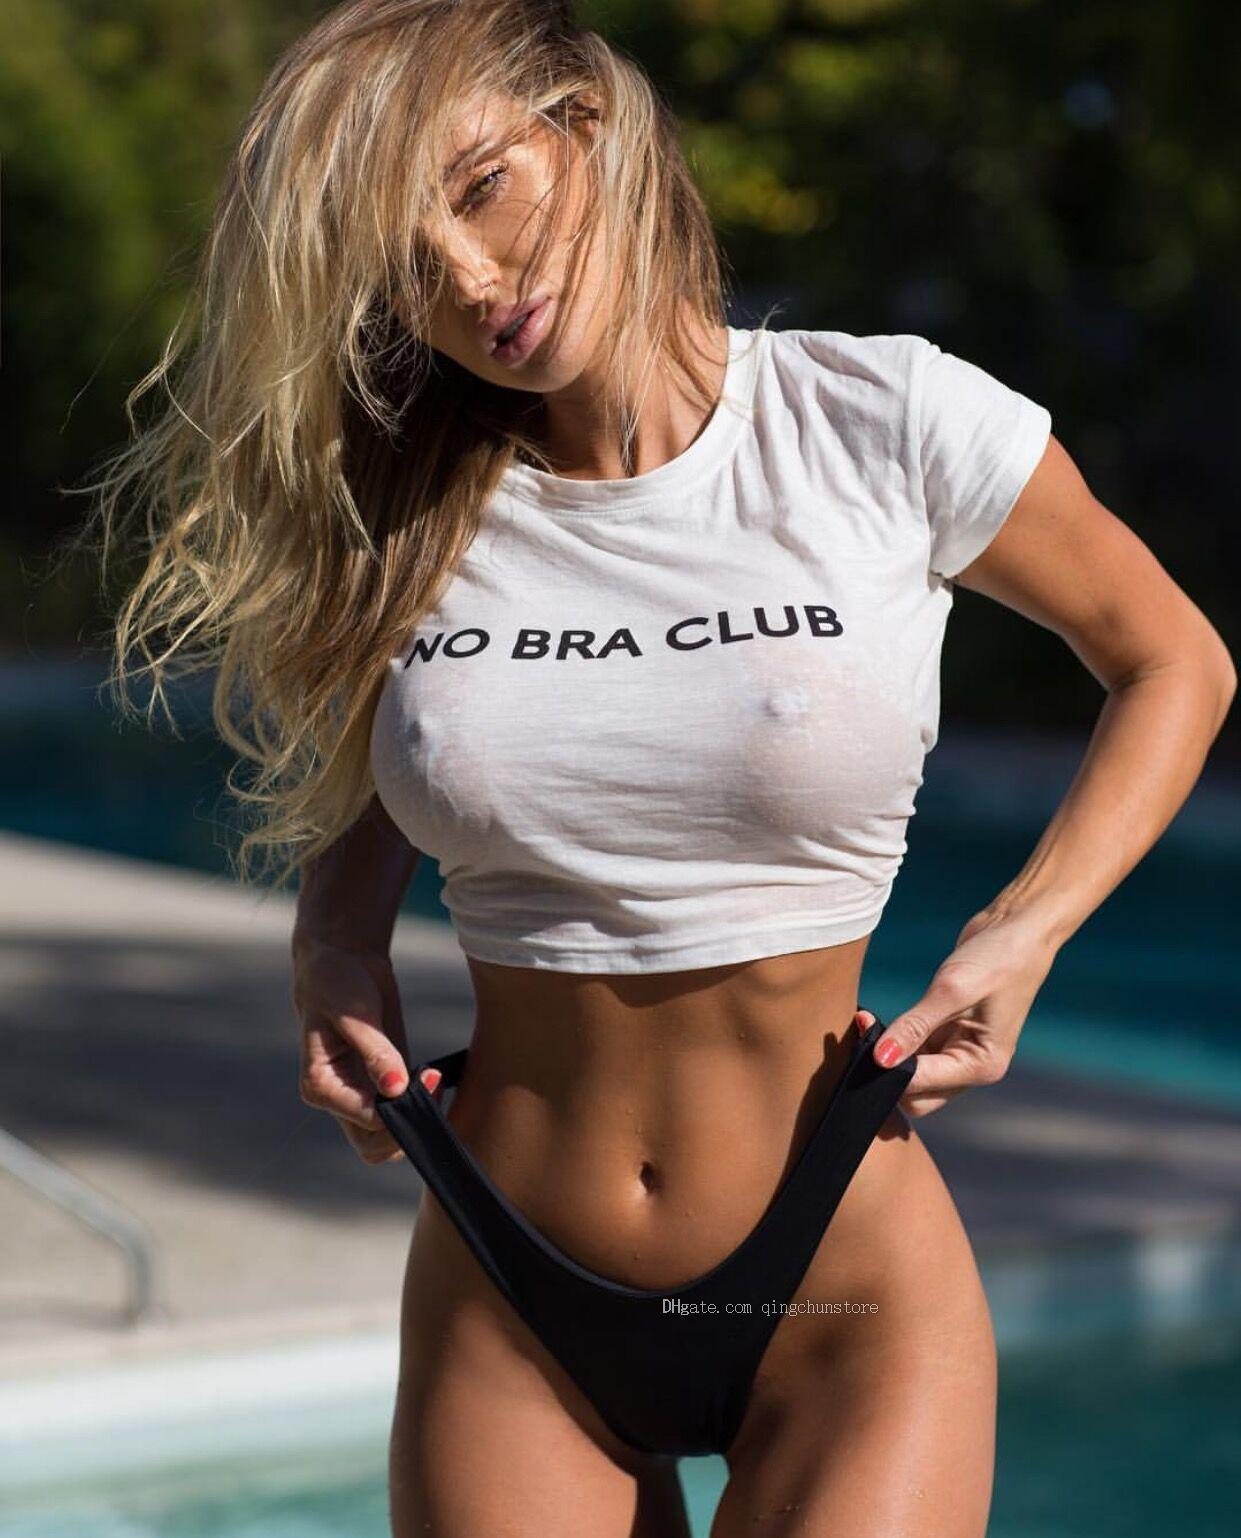 36e1f029a3a2f Fashion Sexy Crop Top No Bra Club Women Harajuku T Shirt White Cotton O  Neck Brief Sheer Short T Shirt Casual Street Tops T Shirts Sites Shirt Tees  From ...